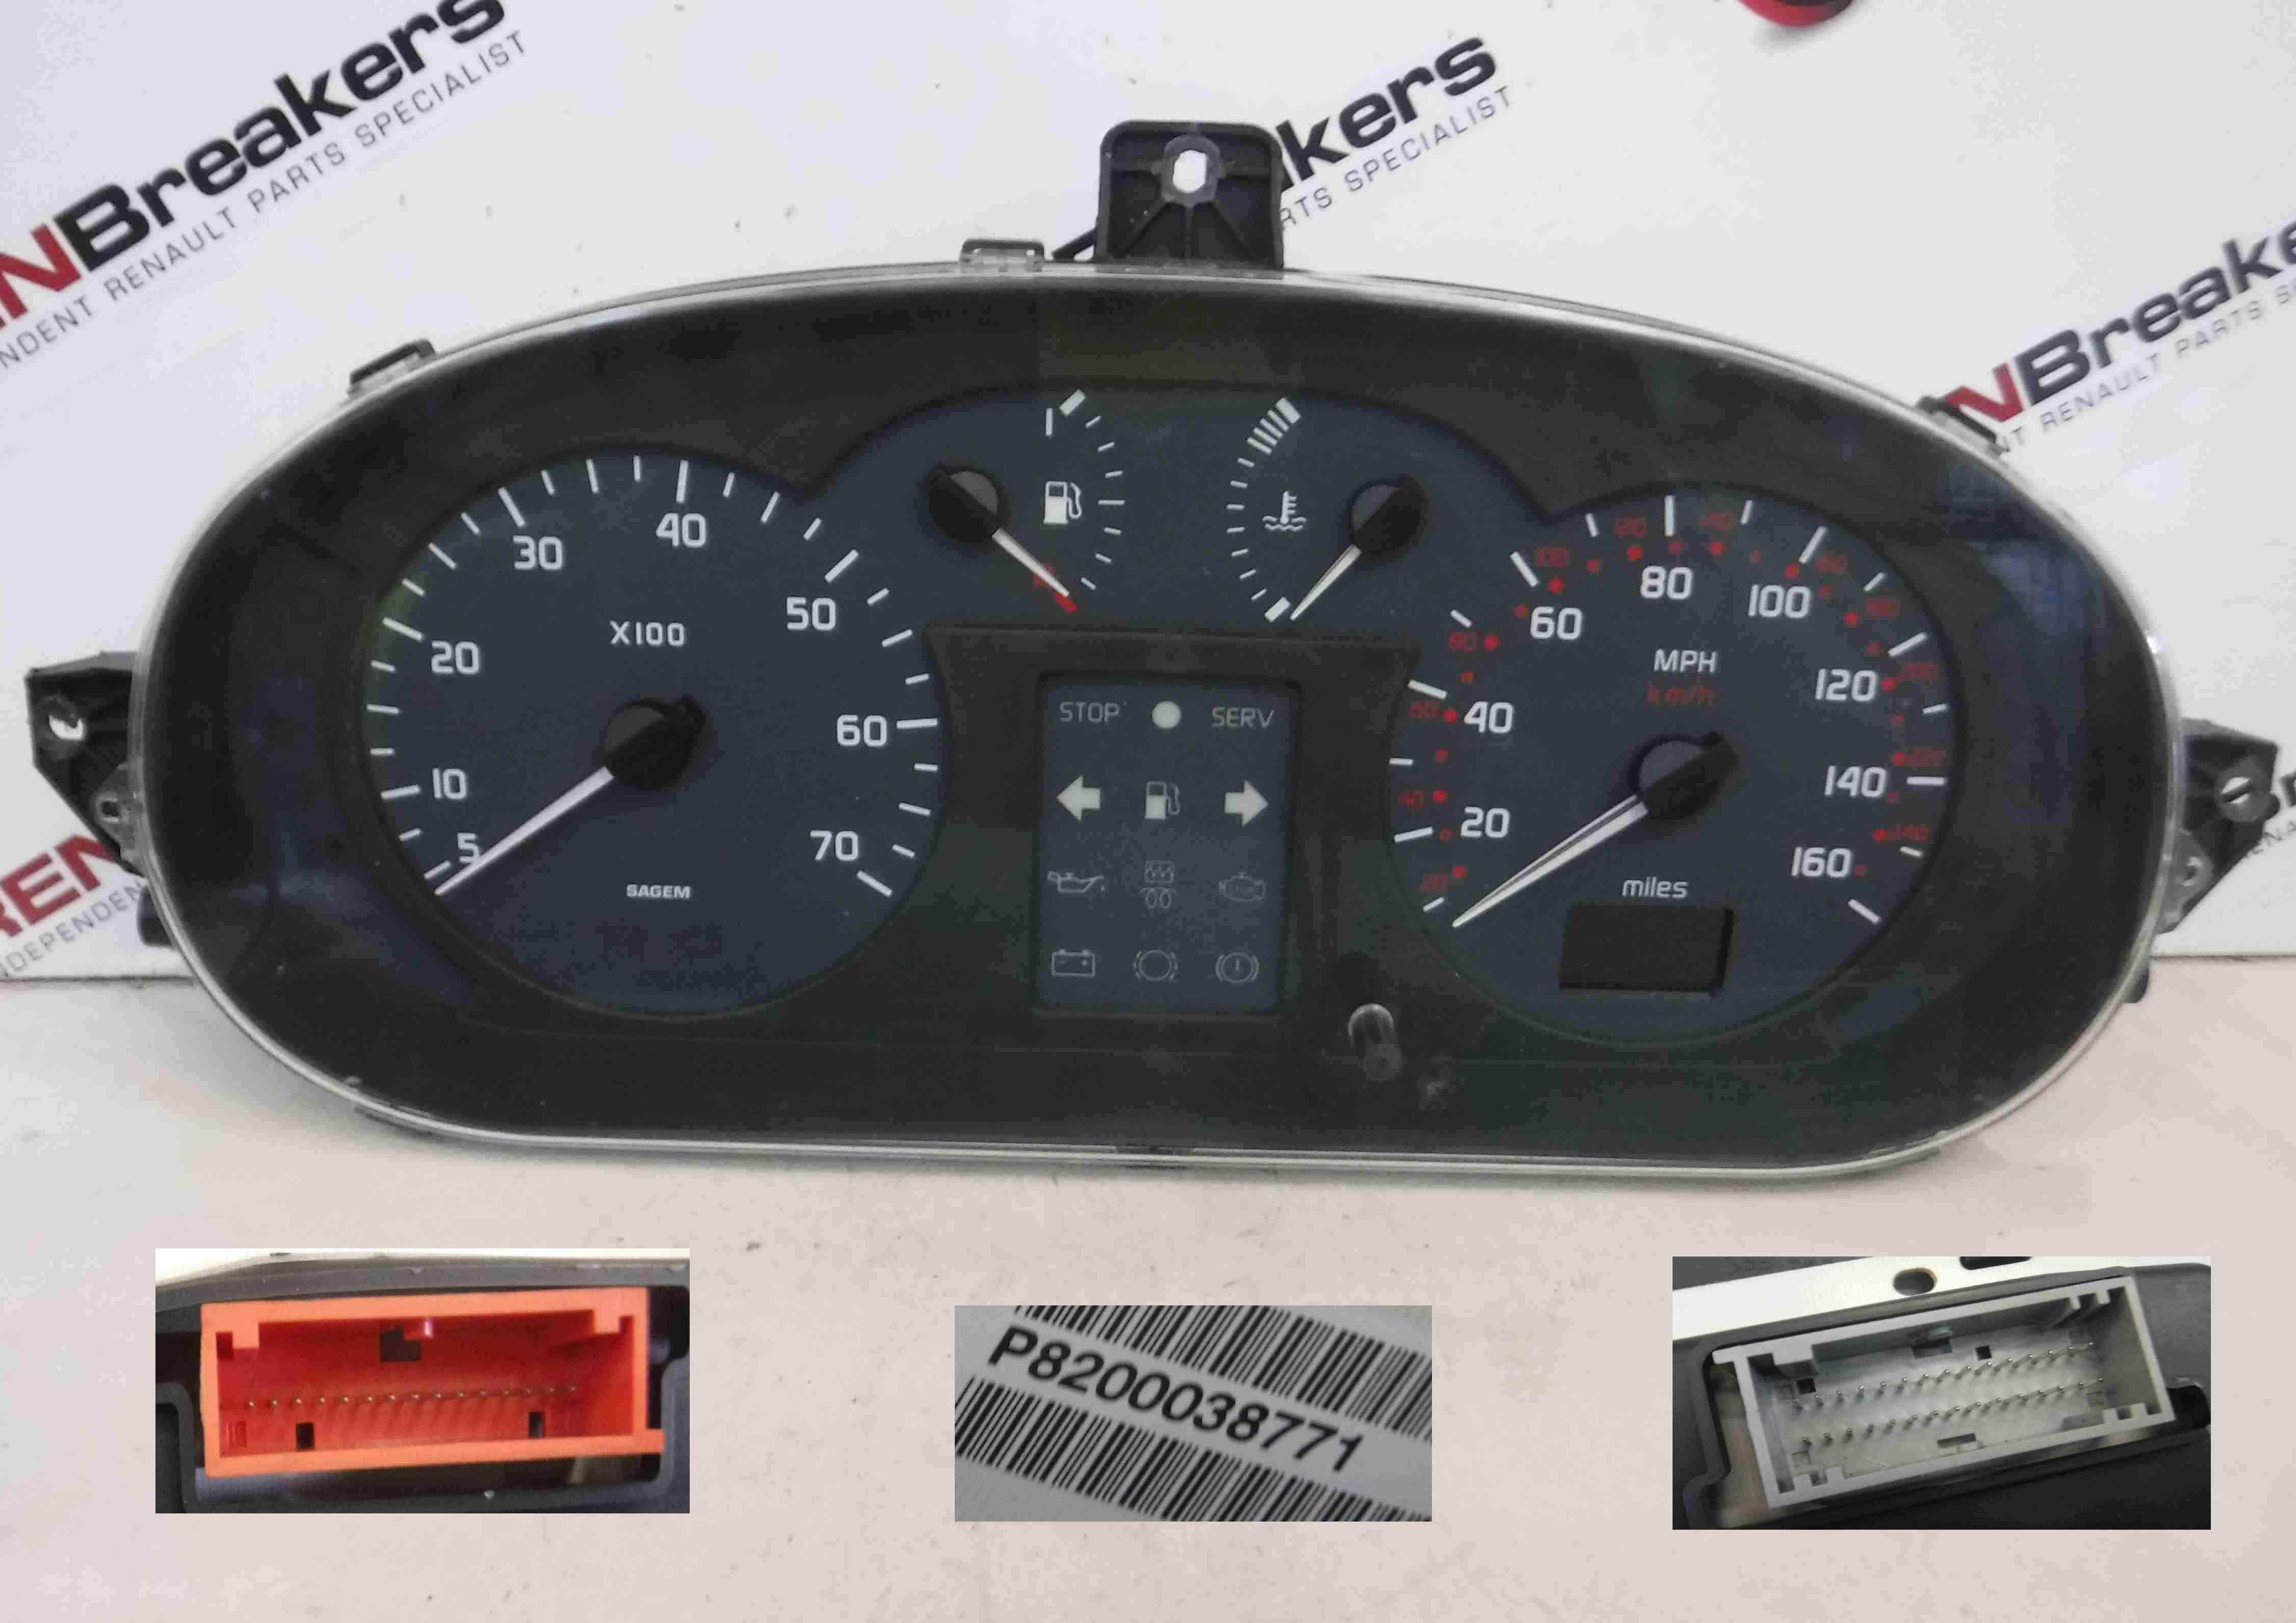 Renault Megane Scenic 1999-2003 Instrument Panel Dials Gauges Clocks 134K